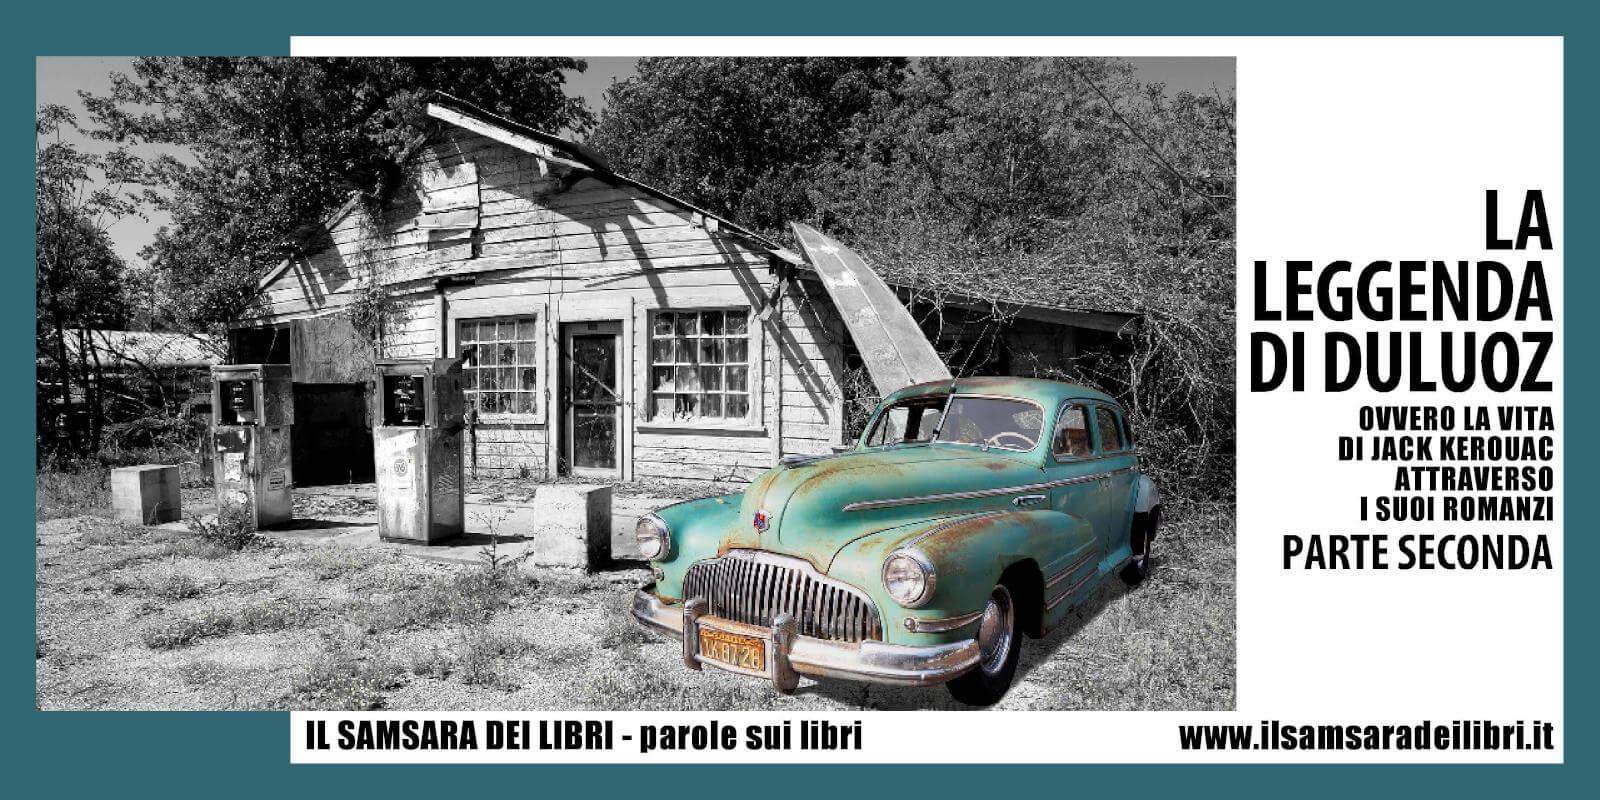 Immagine dellla copertina dedicata ai libri scritti da Jack Kerouac - Leggenda Duluoz - parte seconda